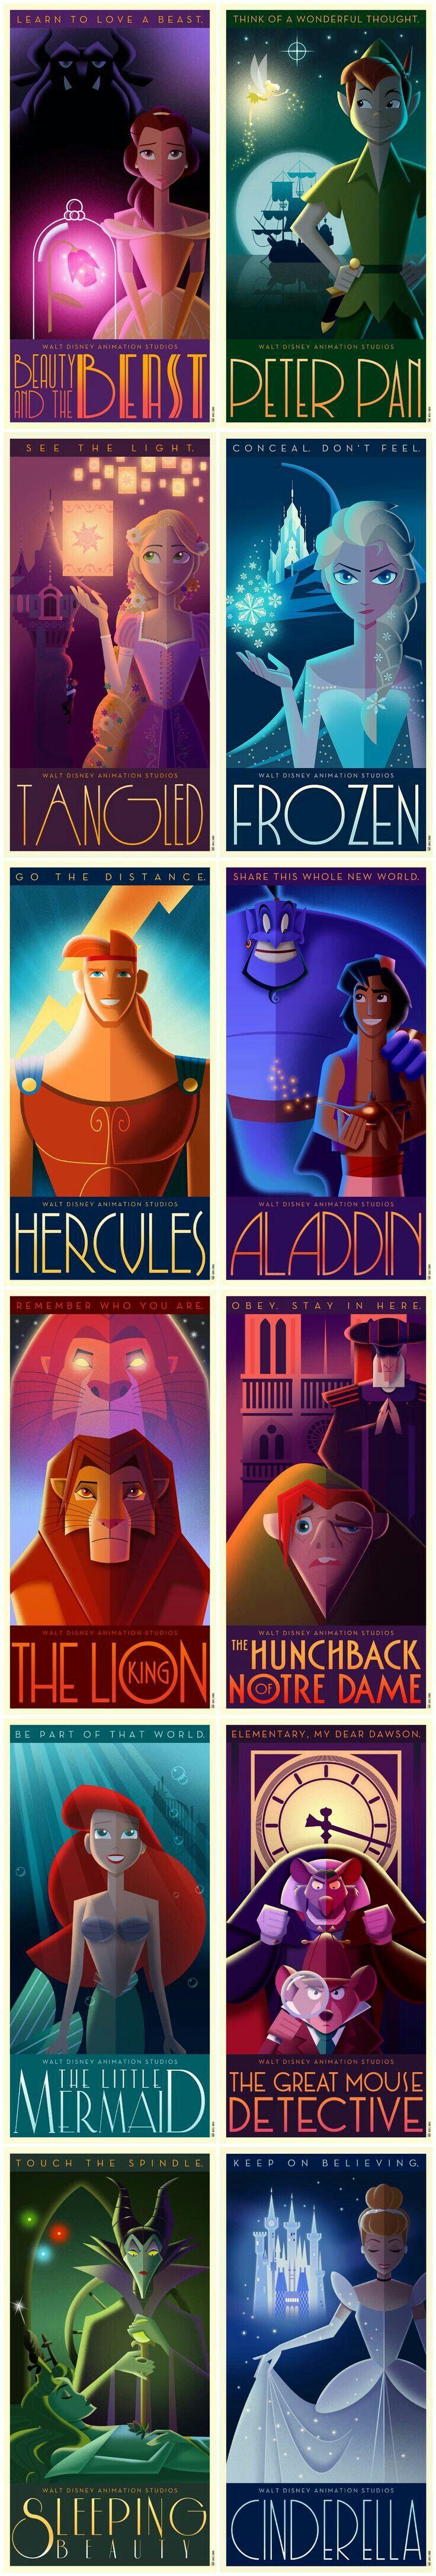 Disney movies fanart posters